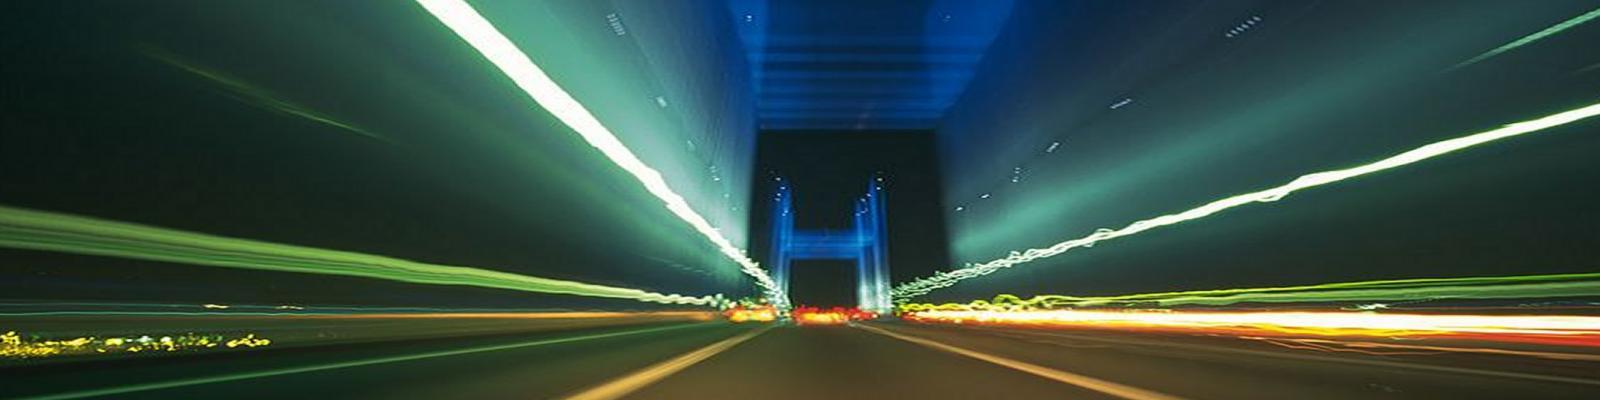 road_004_1600